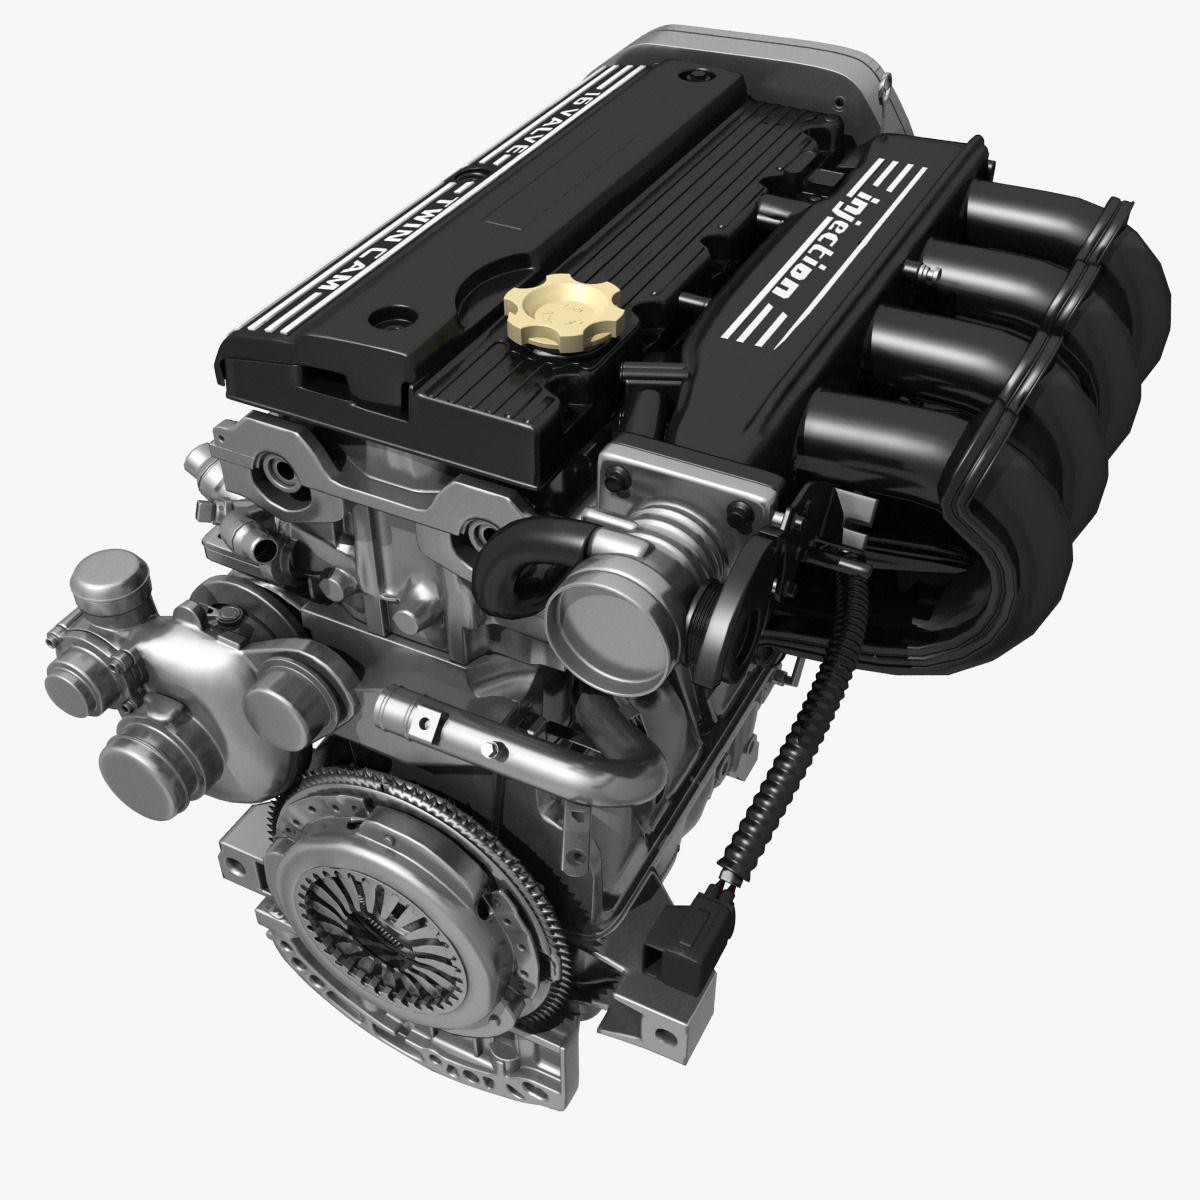 hight resolution of car 4 cylinder engine 02 3d model cgtradercar 4 cylinder engine 02 3d model